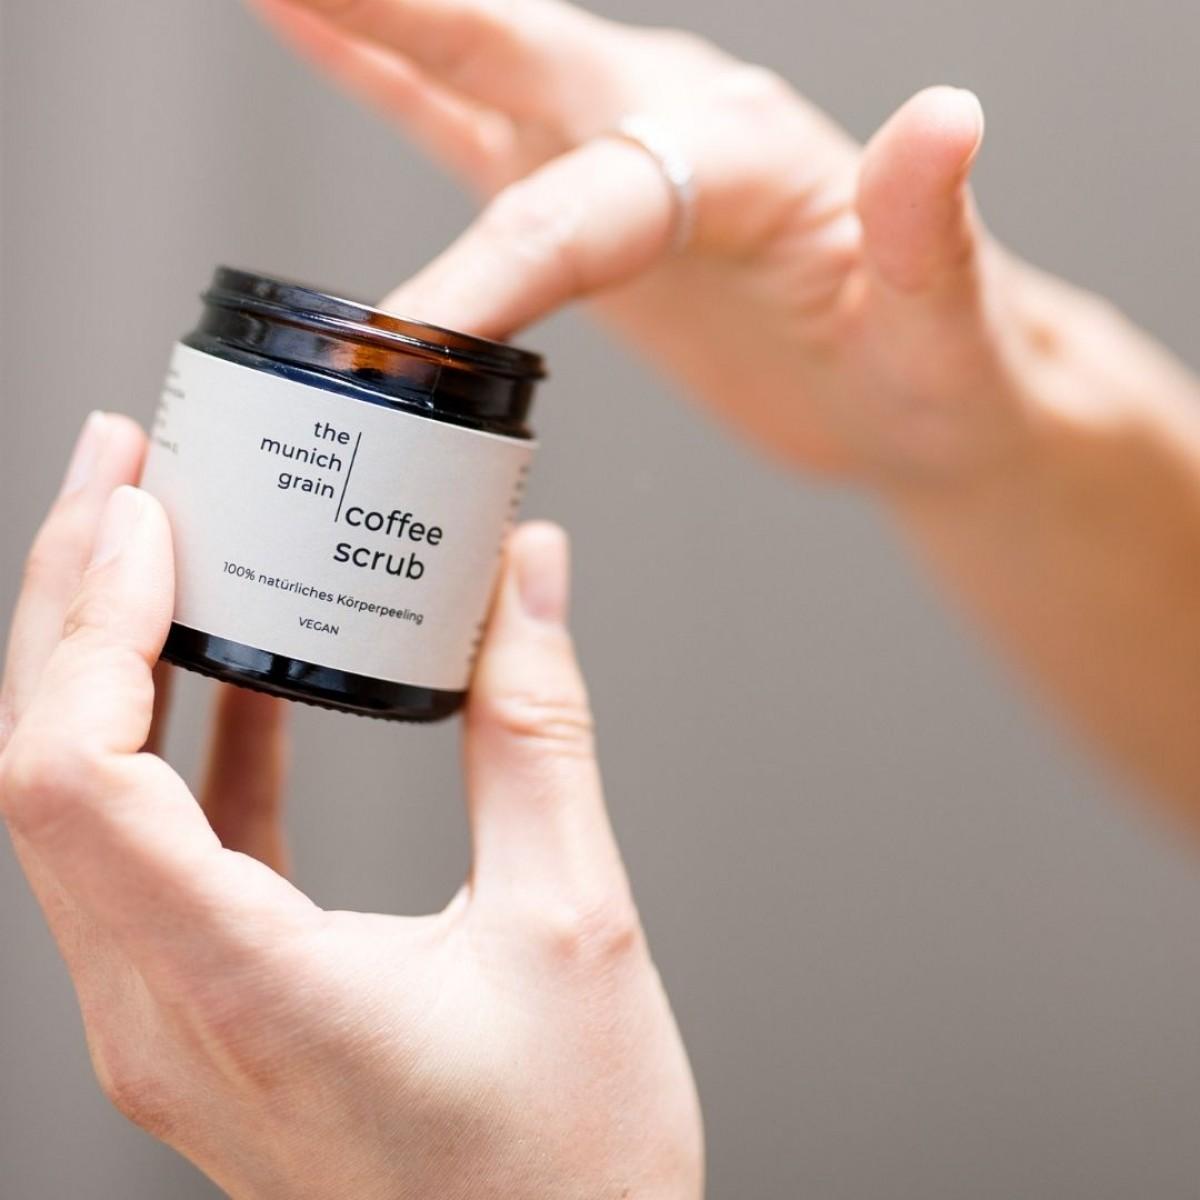 Coffee Scrub (veganes Kaffee-Peeling) von the munich grain (120ml)